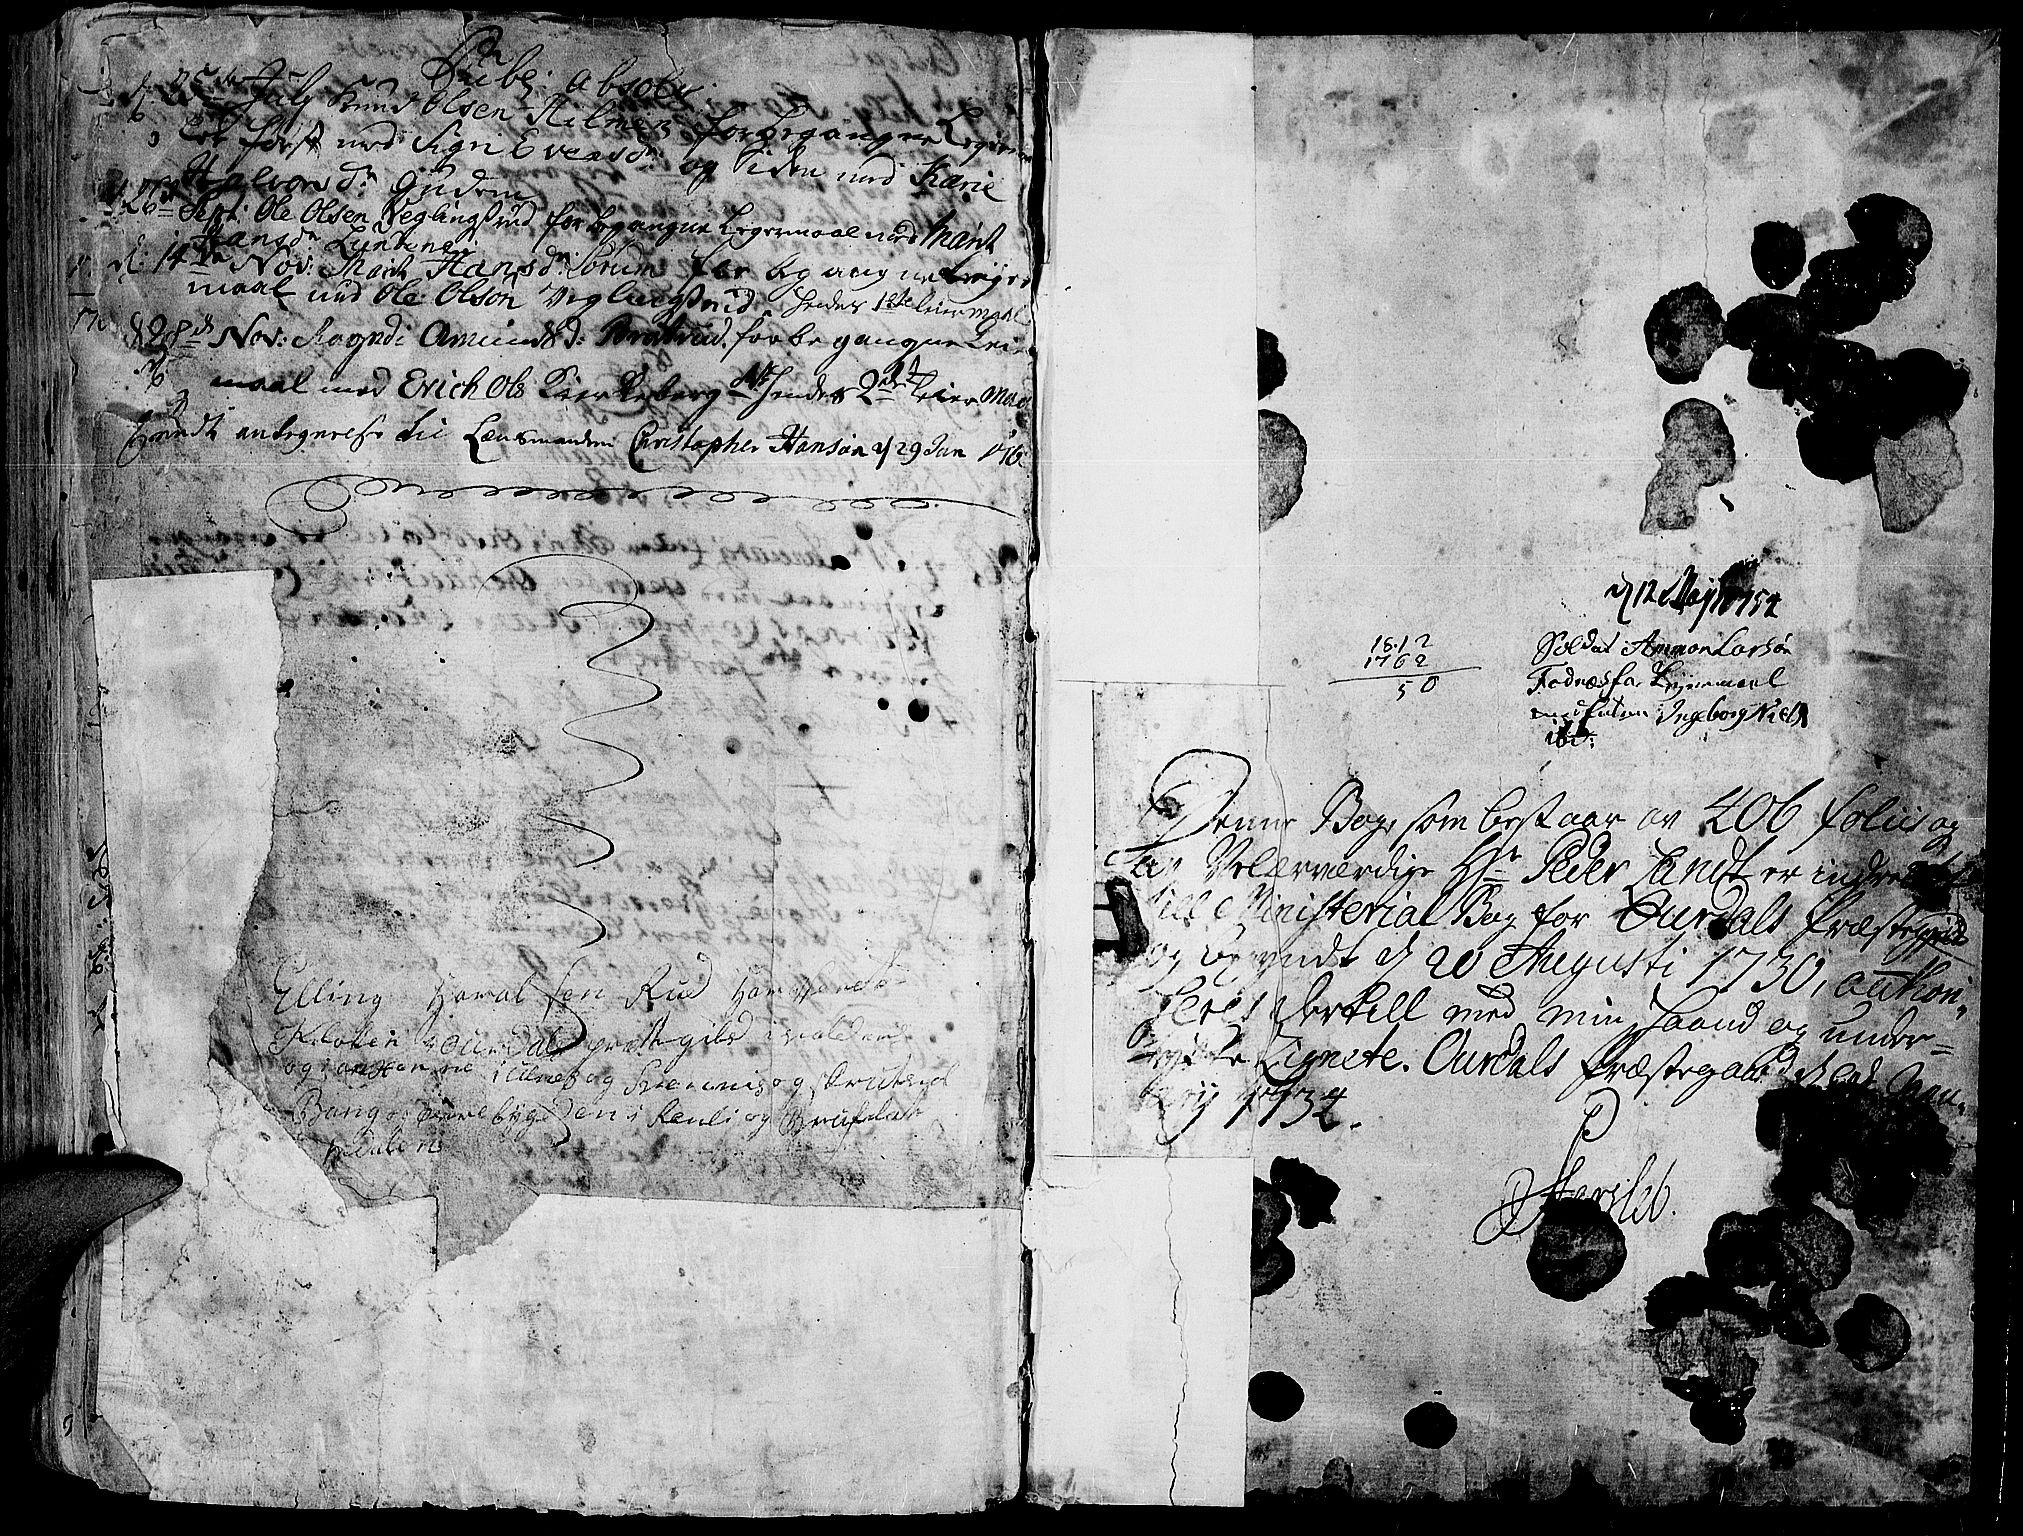 SAH, Aurdal prestekontor, Ministerialbok nr. 4, 1730-1762, s. 32-33